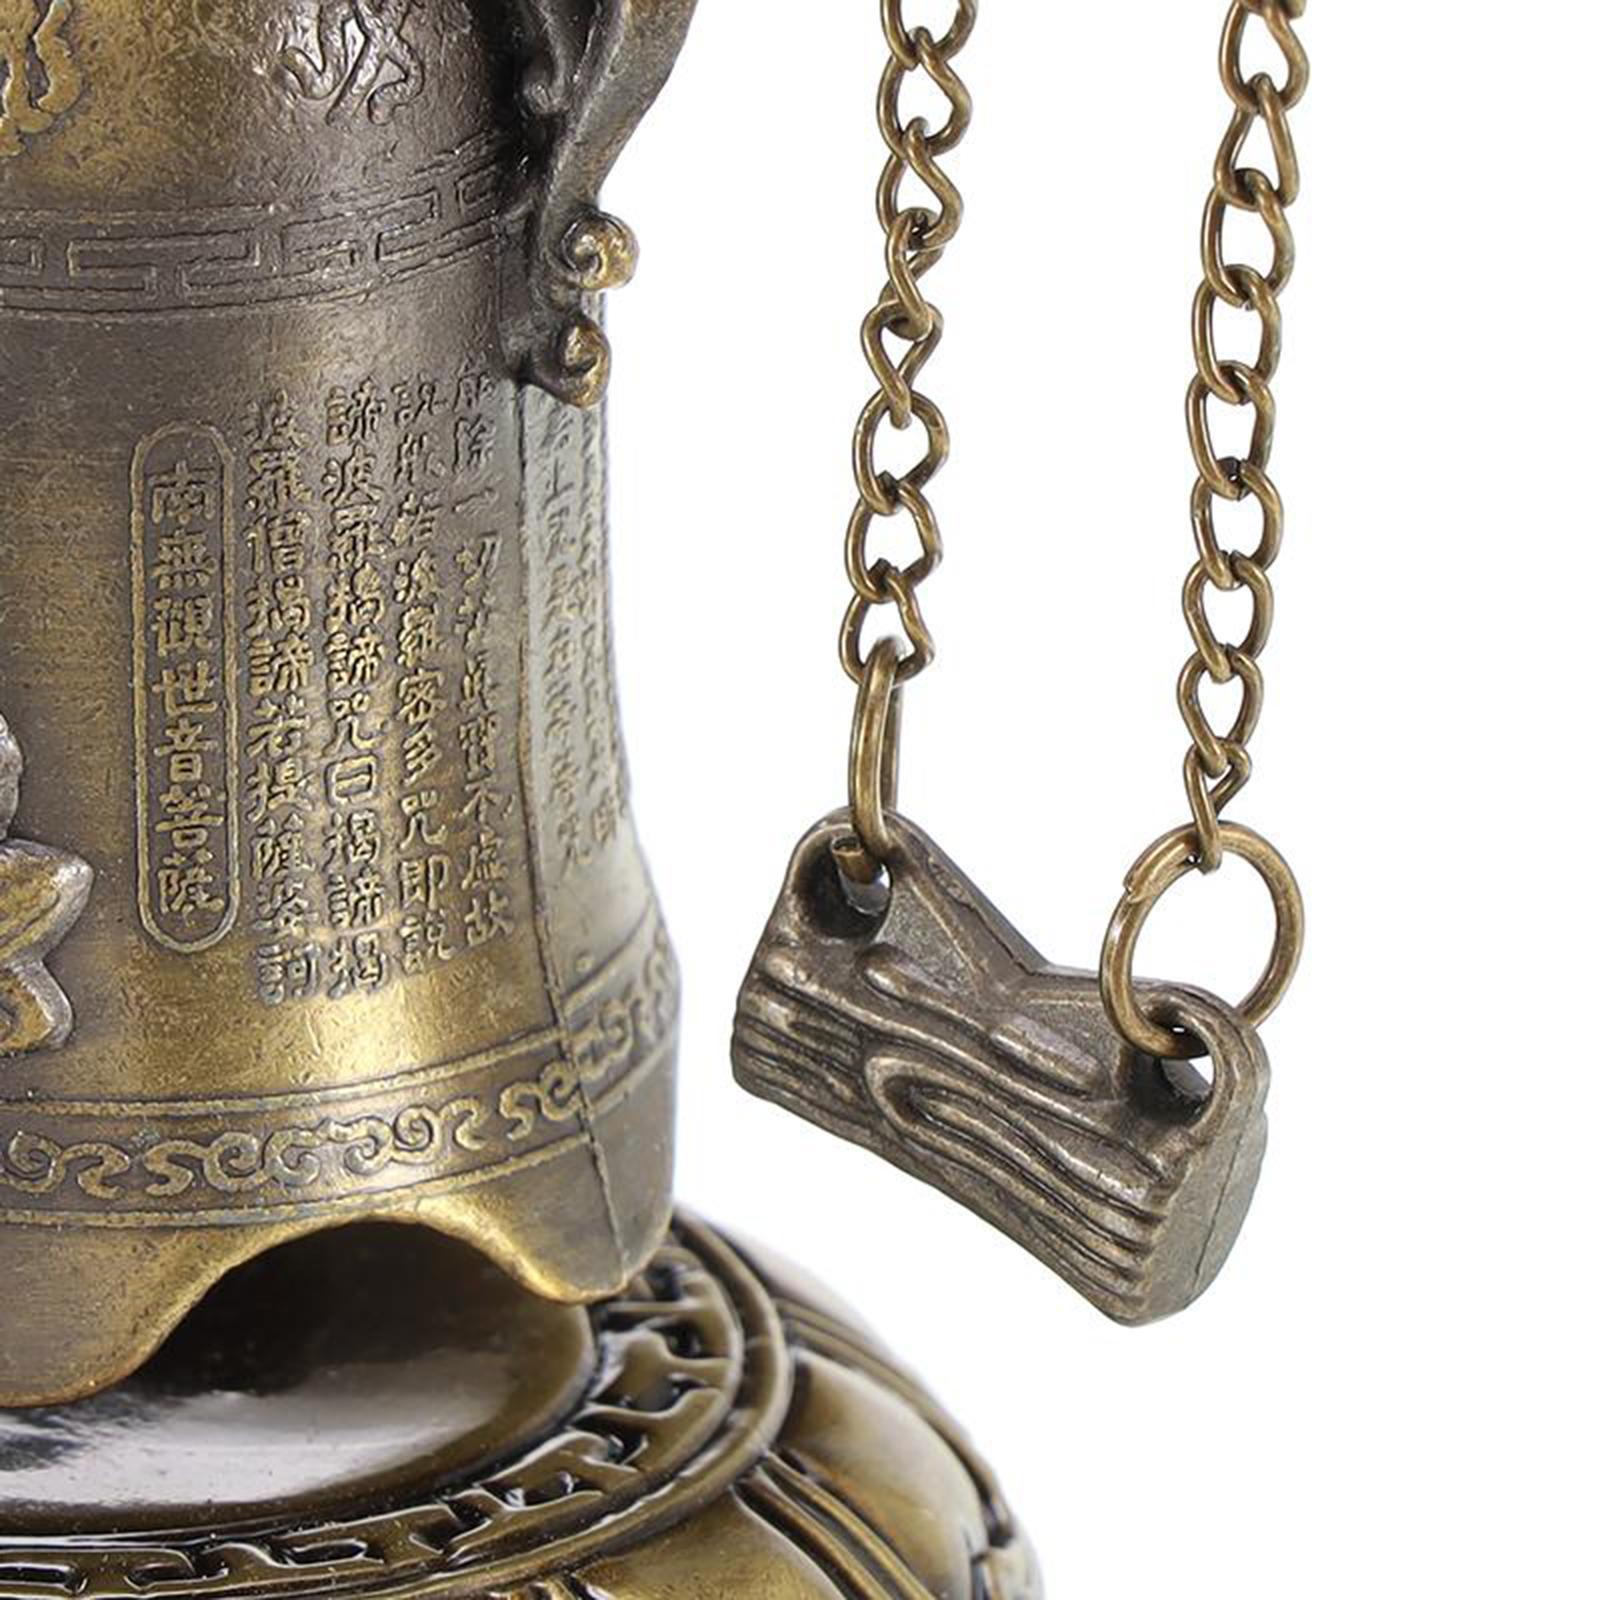 miniatura 9 - Buddha Drago Fengshui campana giocattoli tibetano per Home GIARDINO